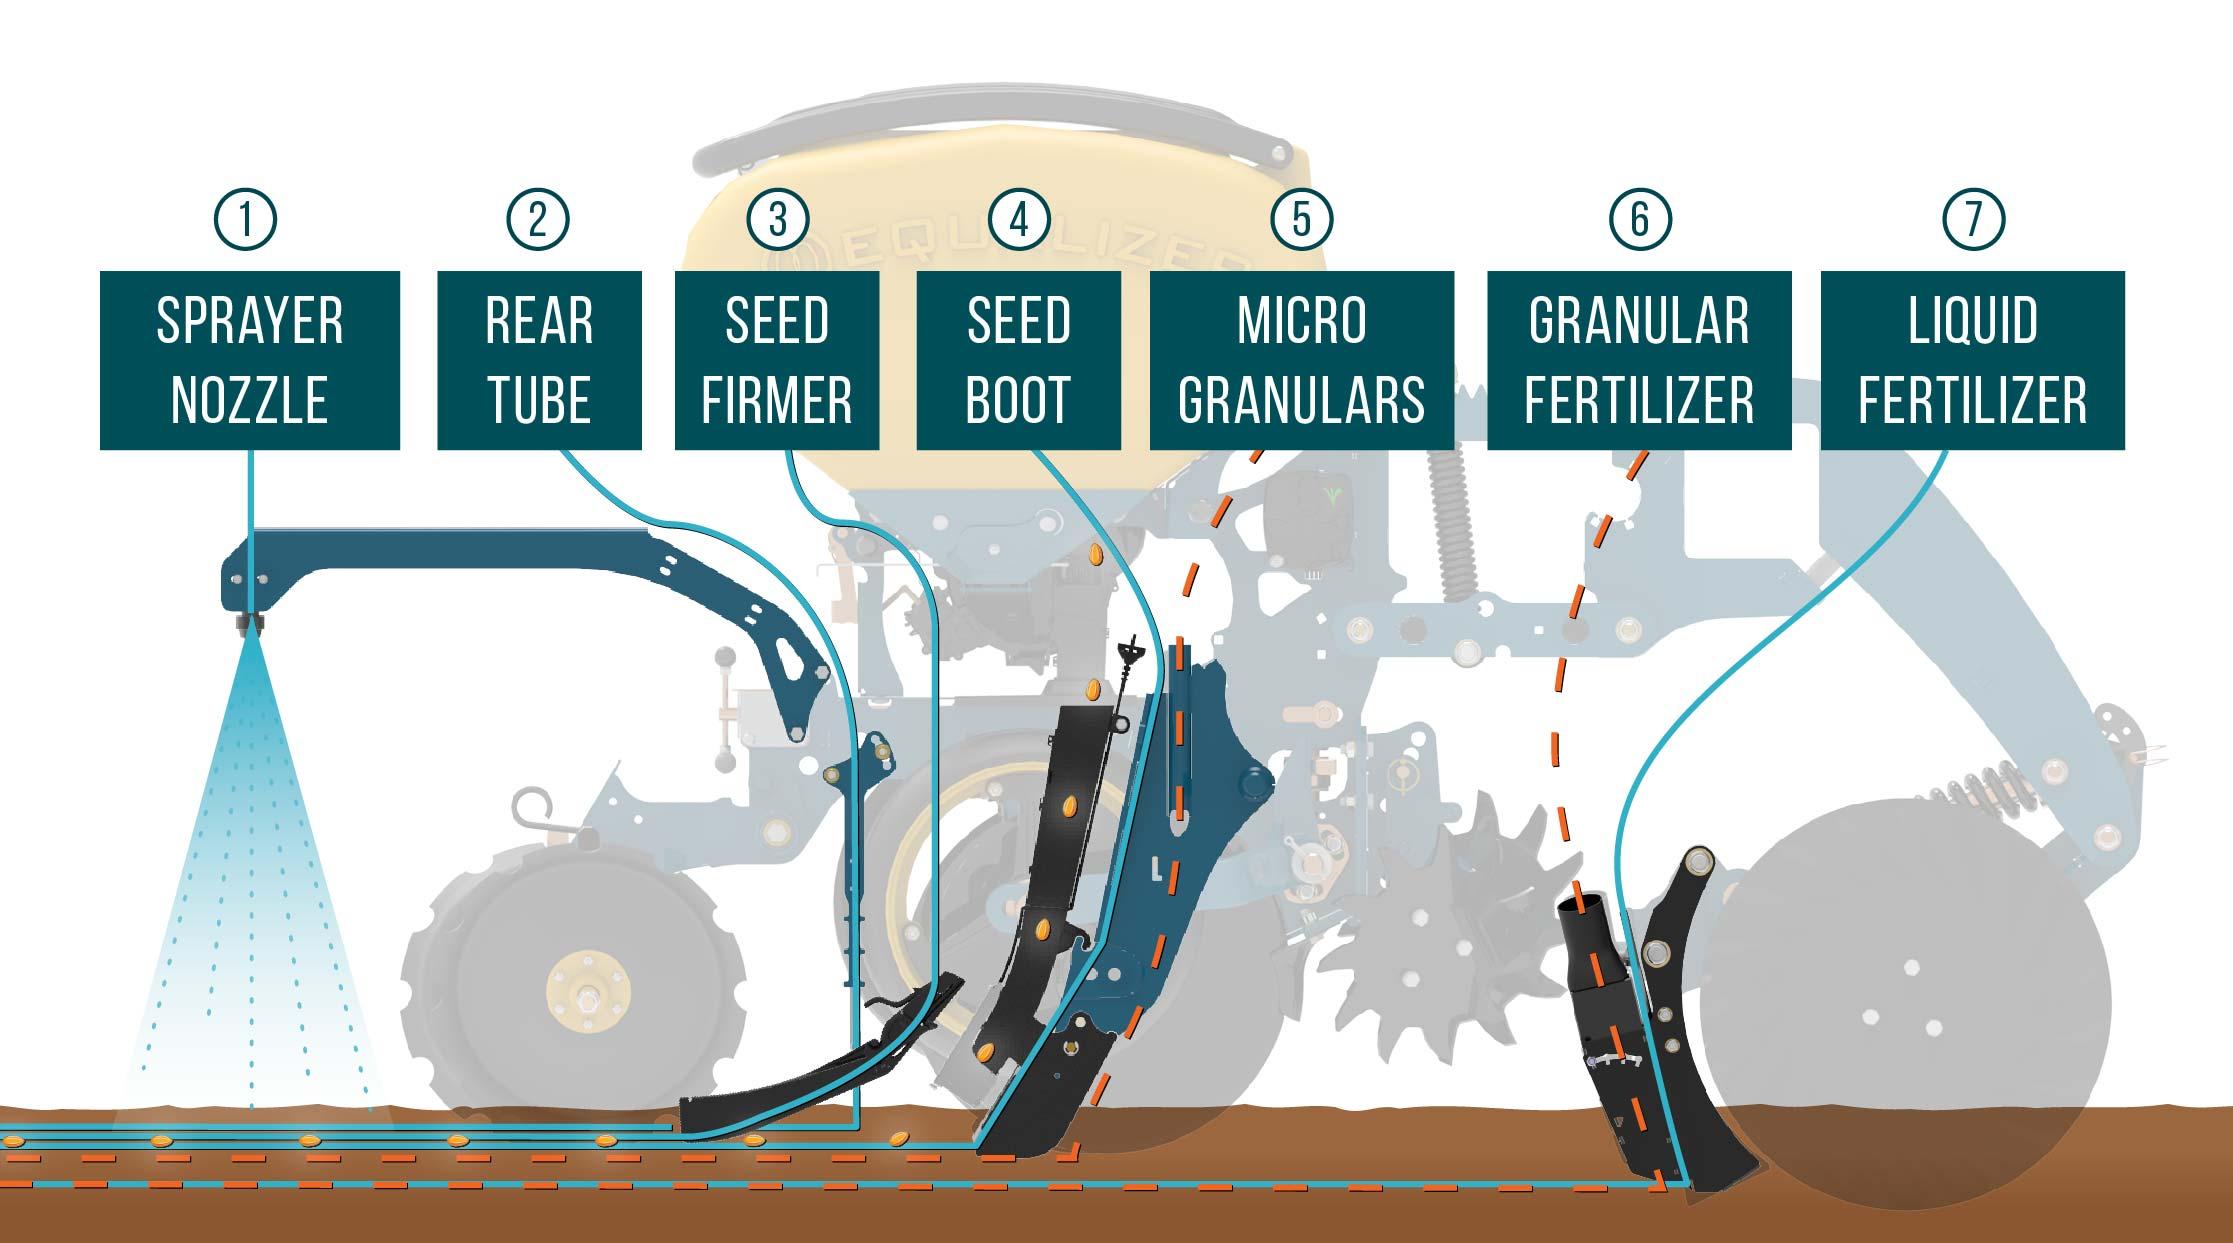 Fertilizer, micro granular, inoculants and herbicide application options